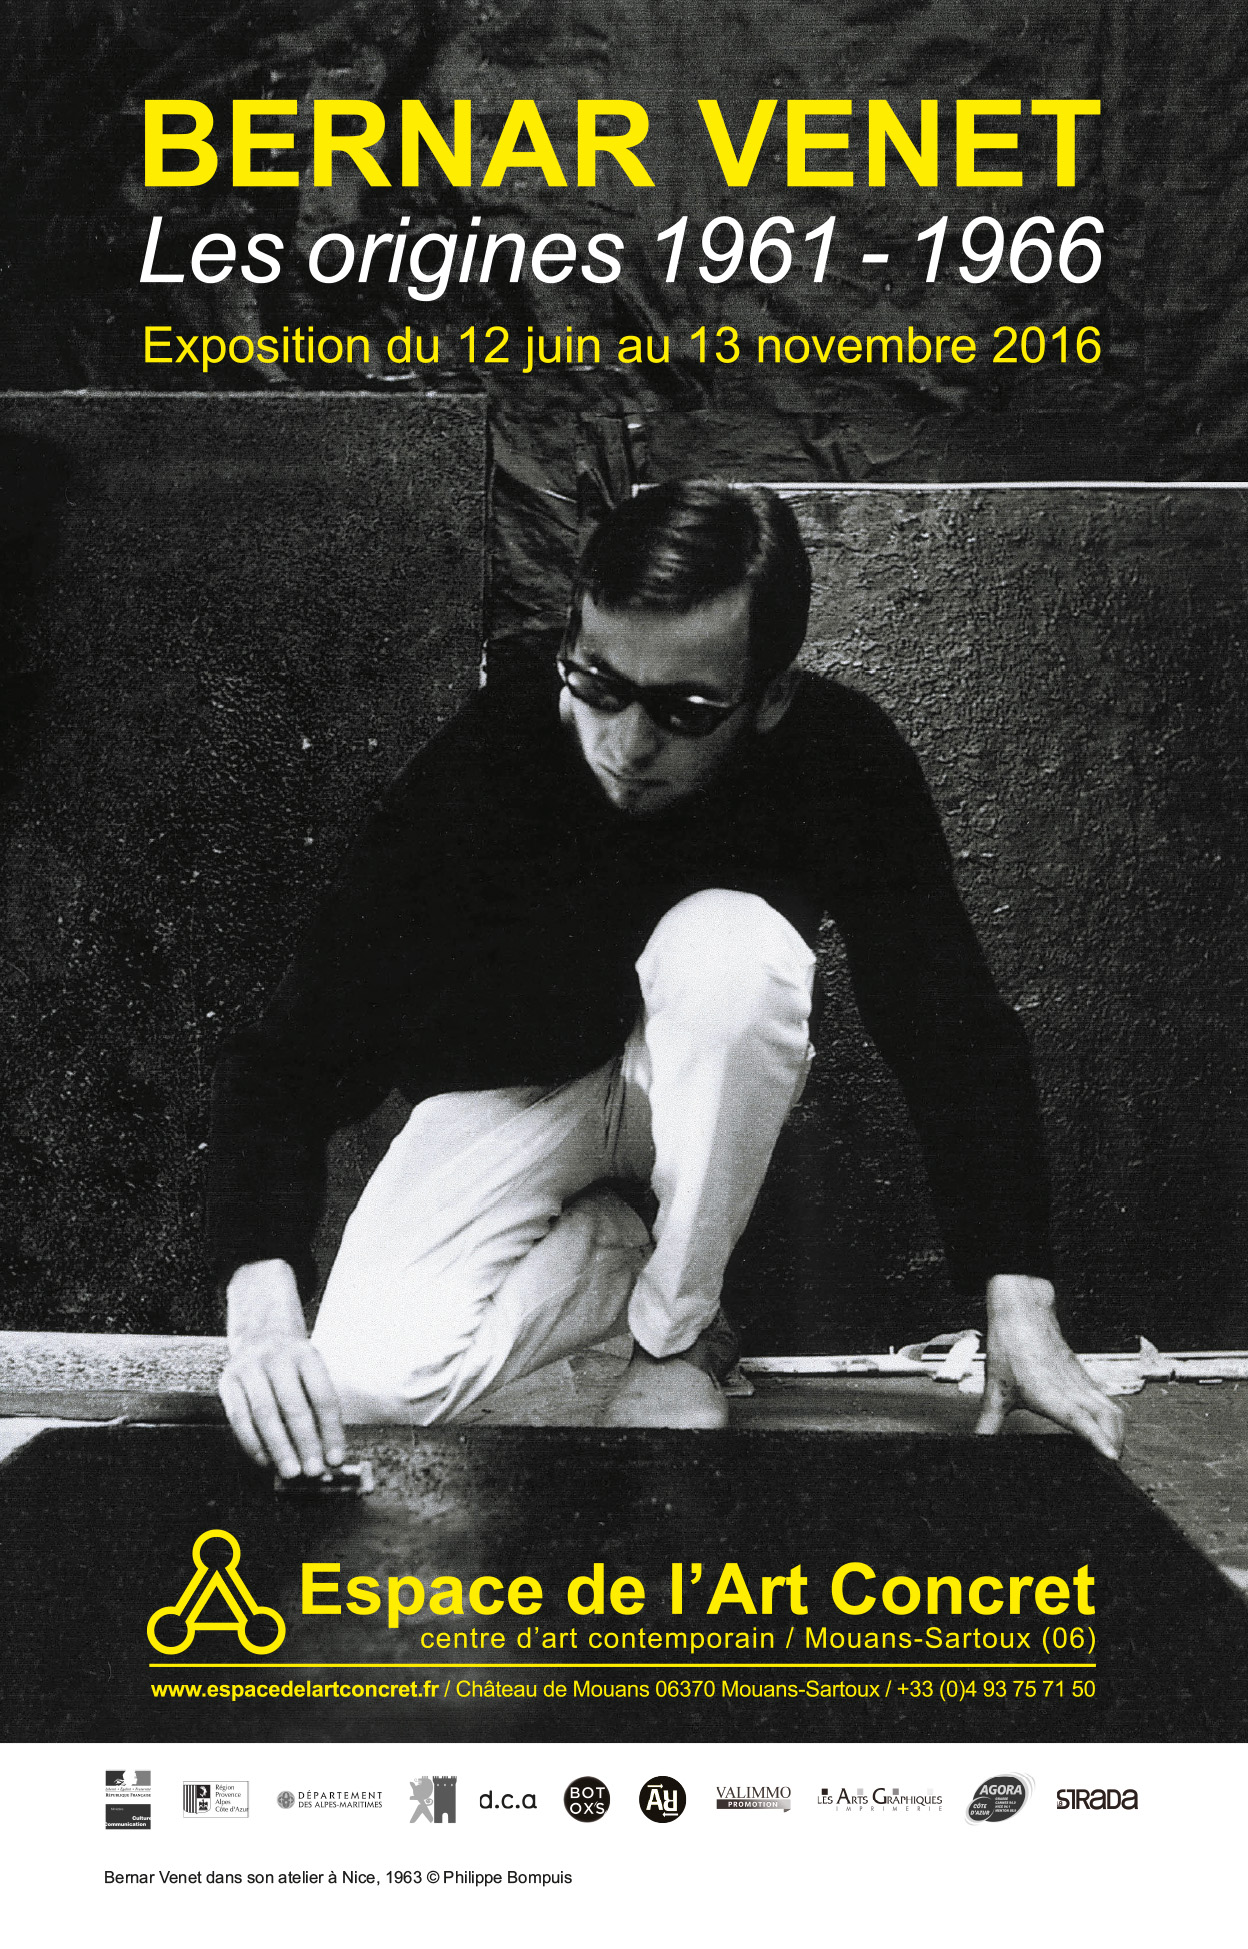 Bernar Venet, Les origines 1961 - 1966